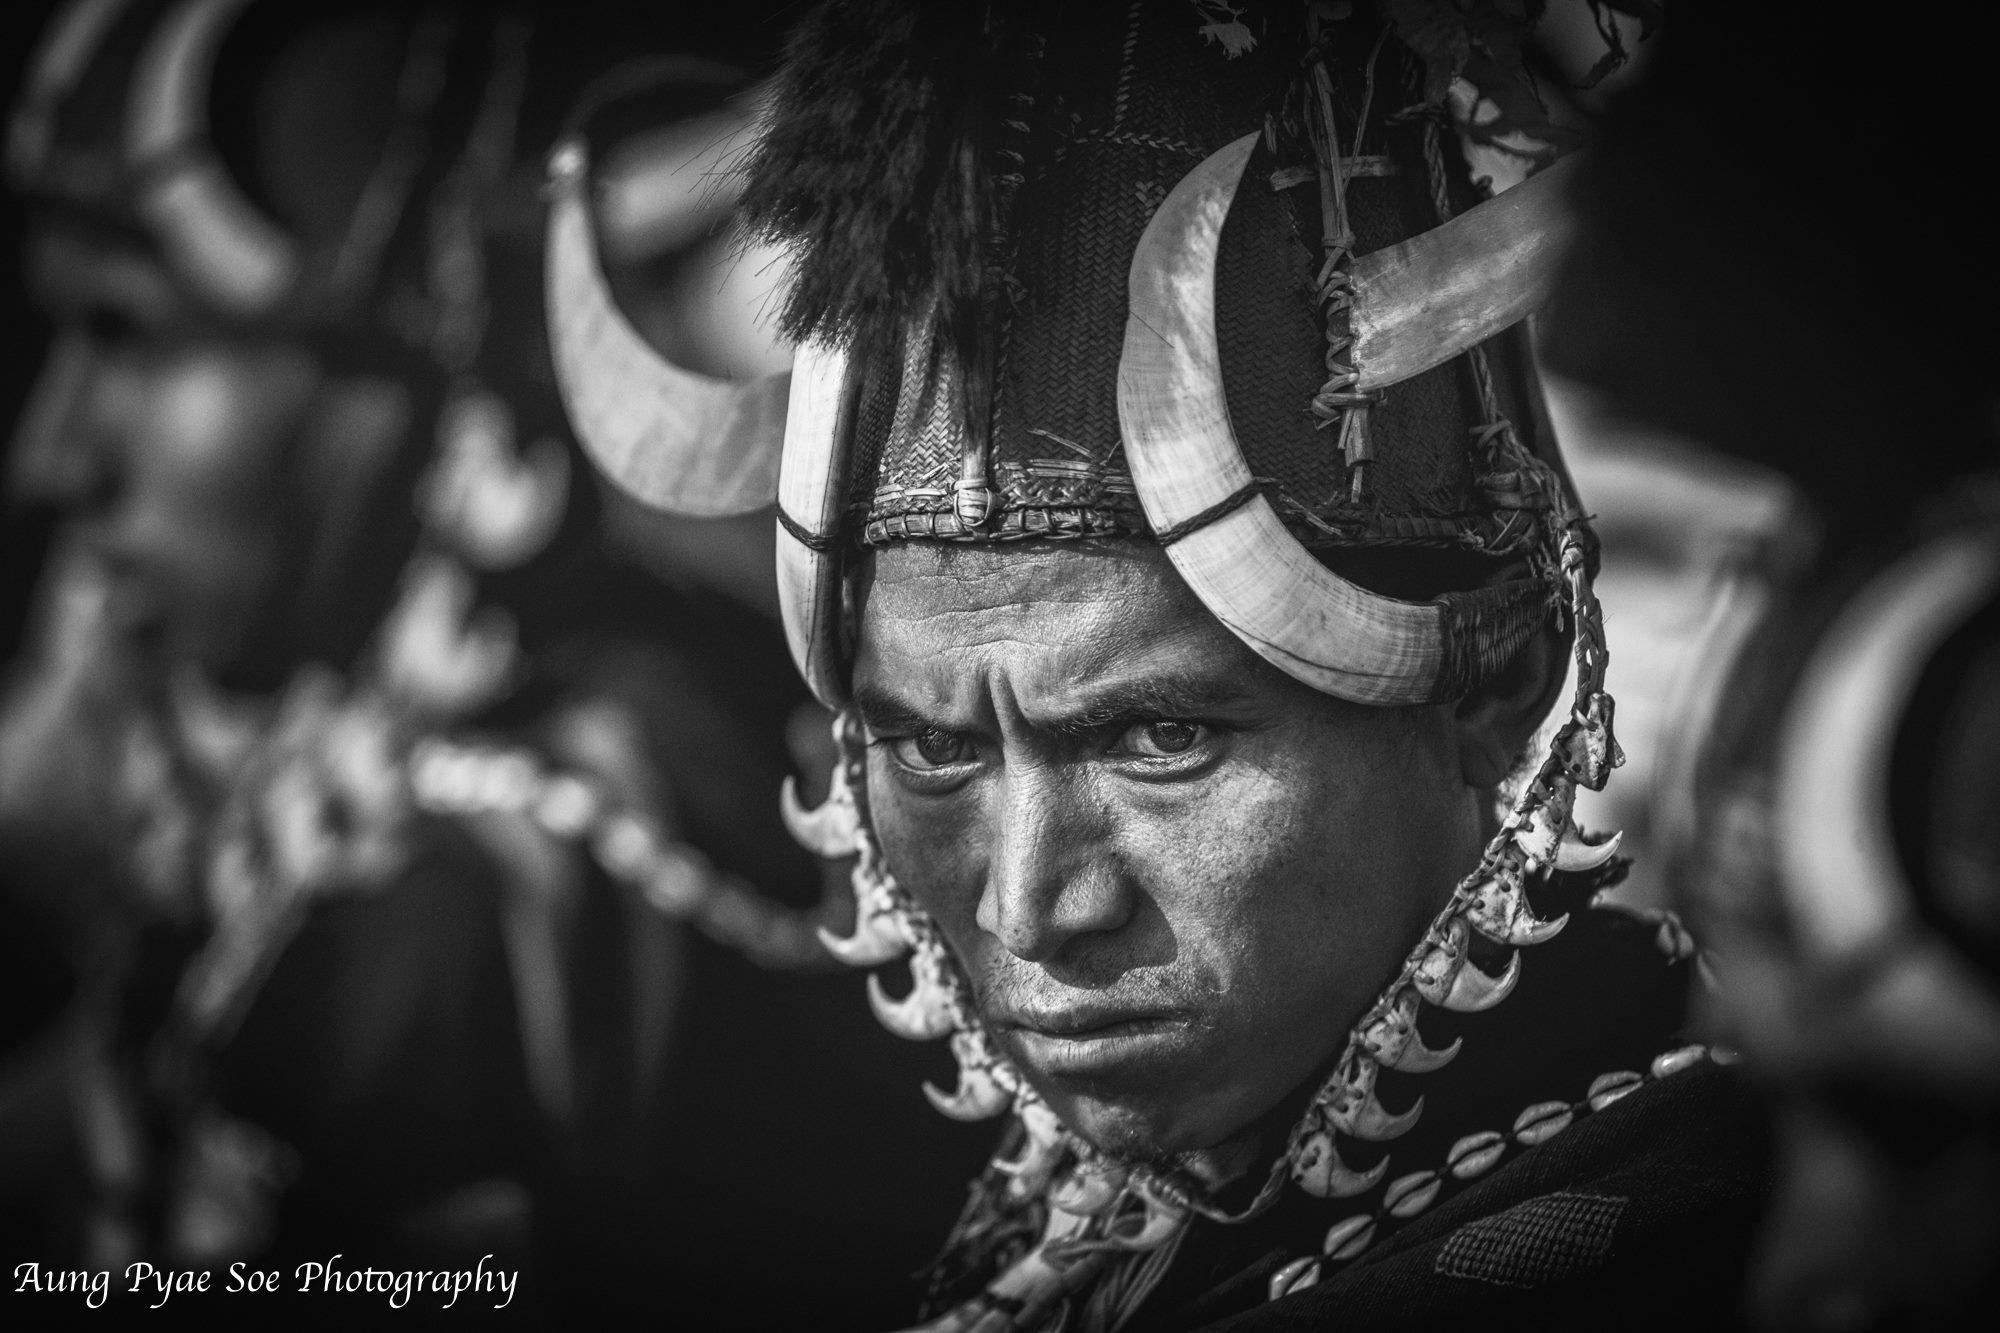 Naga-Burma_Aung-Pyae-Soe